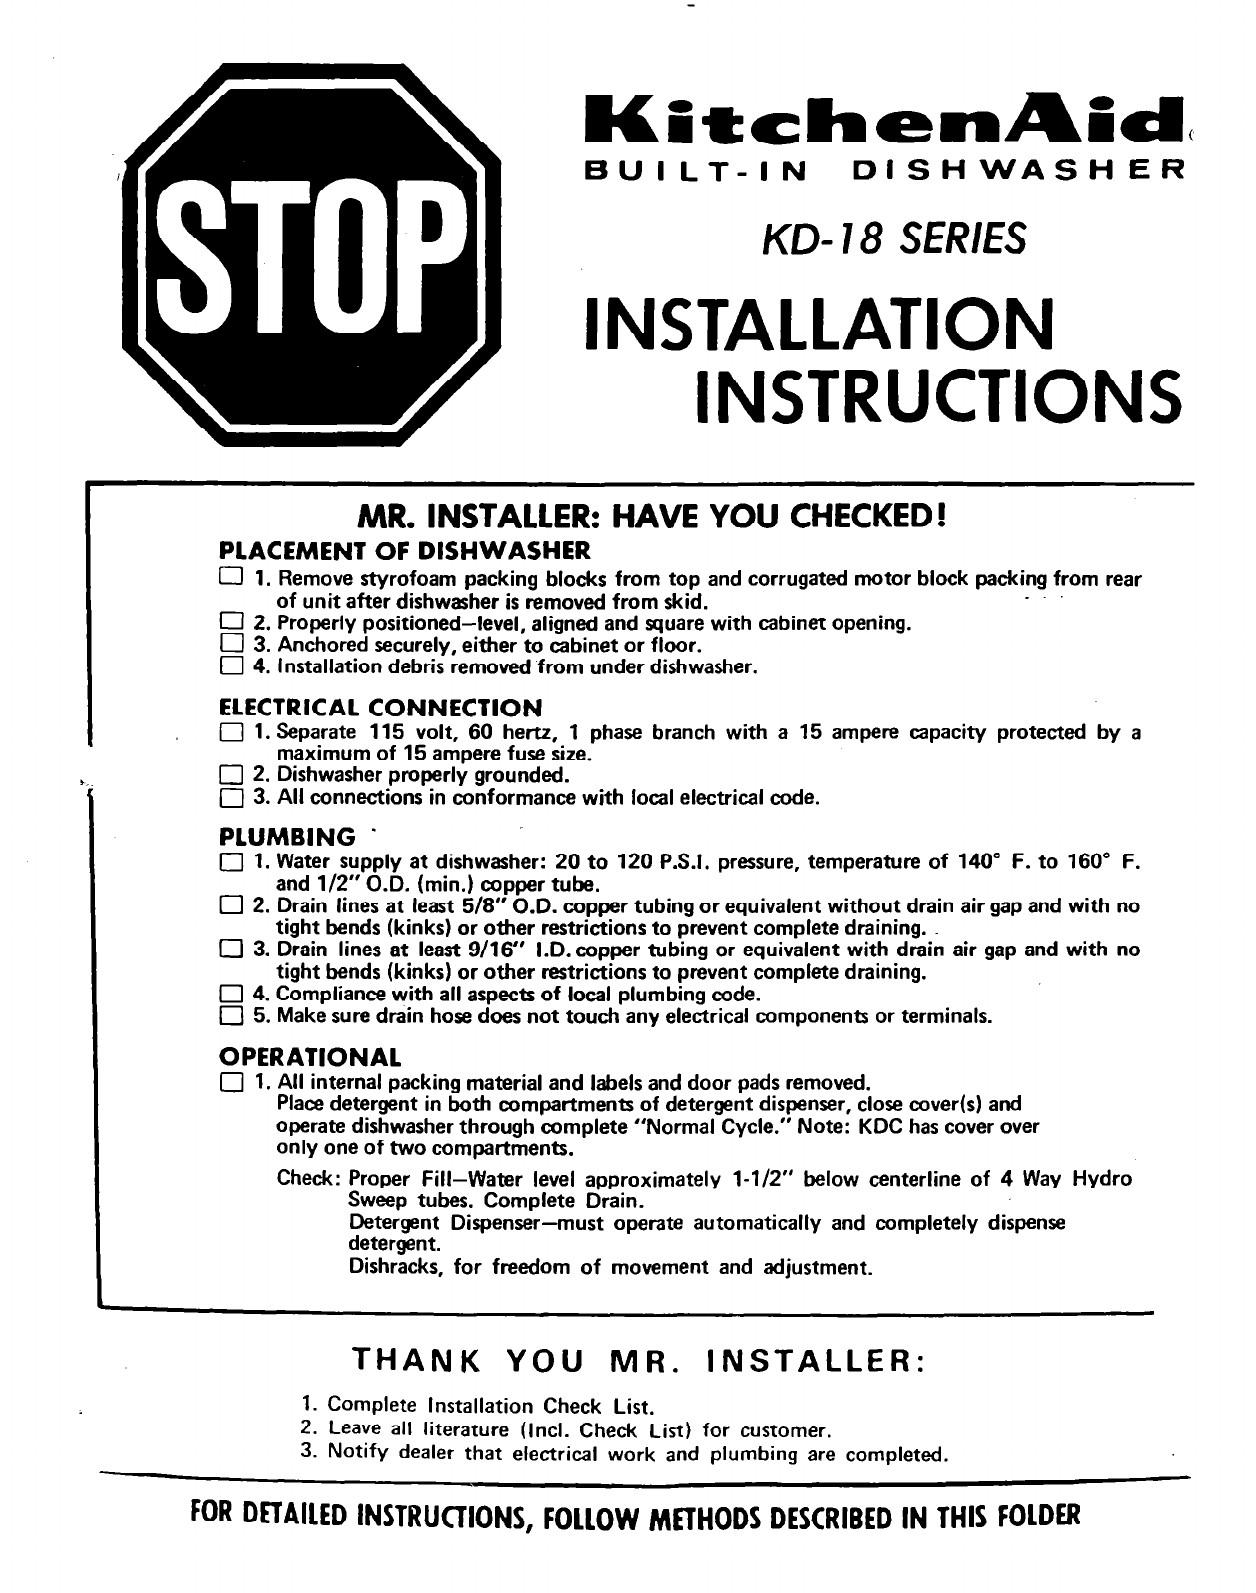 KitchenAid KD 18 Dishwasher User Manual